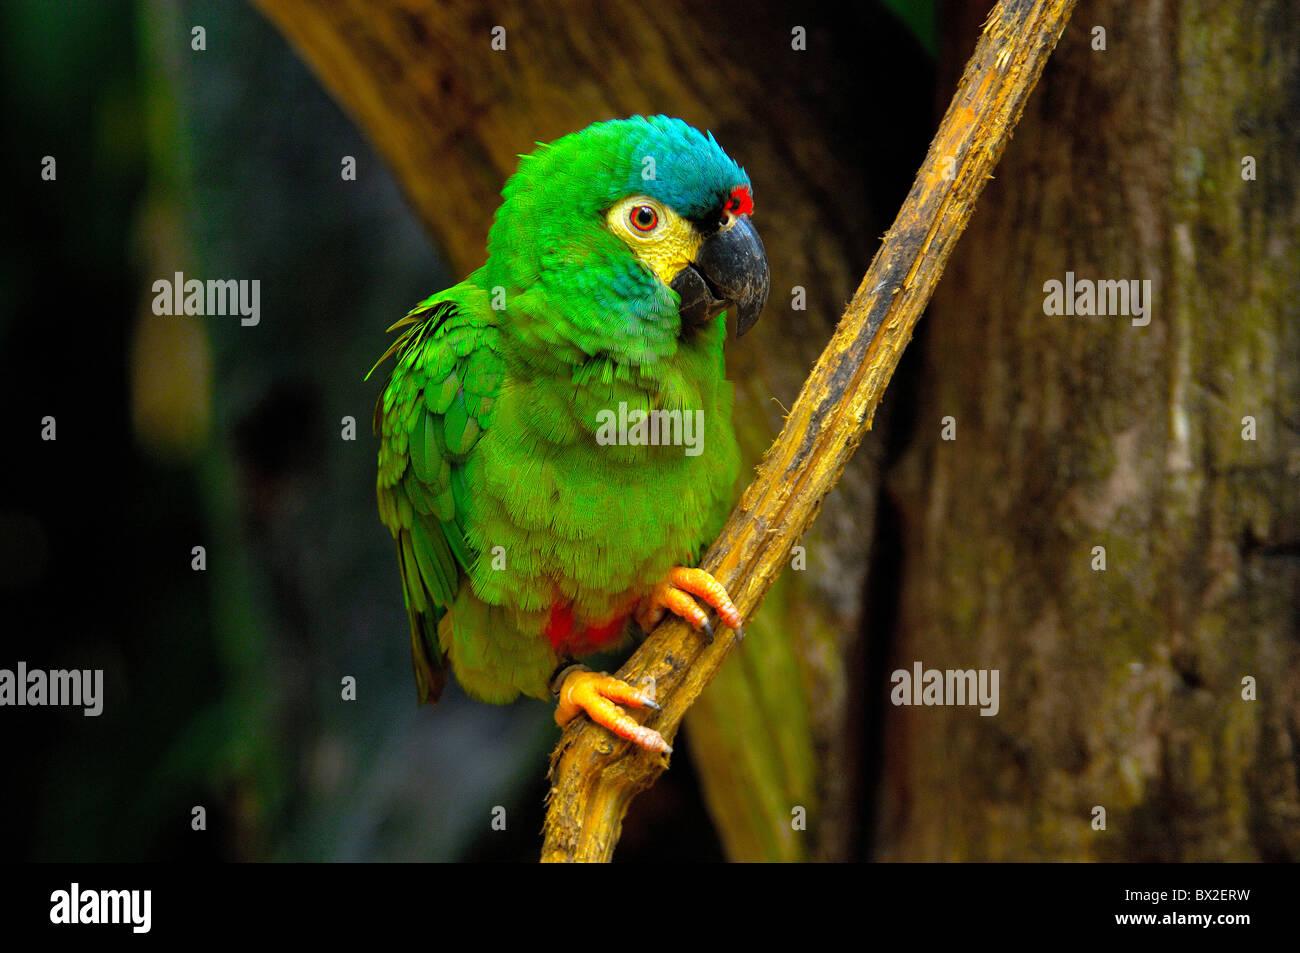 parrot bird tropics Parque das aves Foz do Iguazu Iguacu Iguassu Falls Parana Brazil - Stock Image